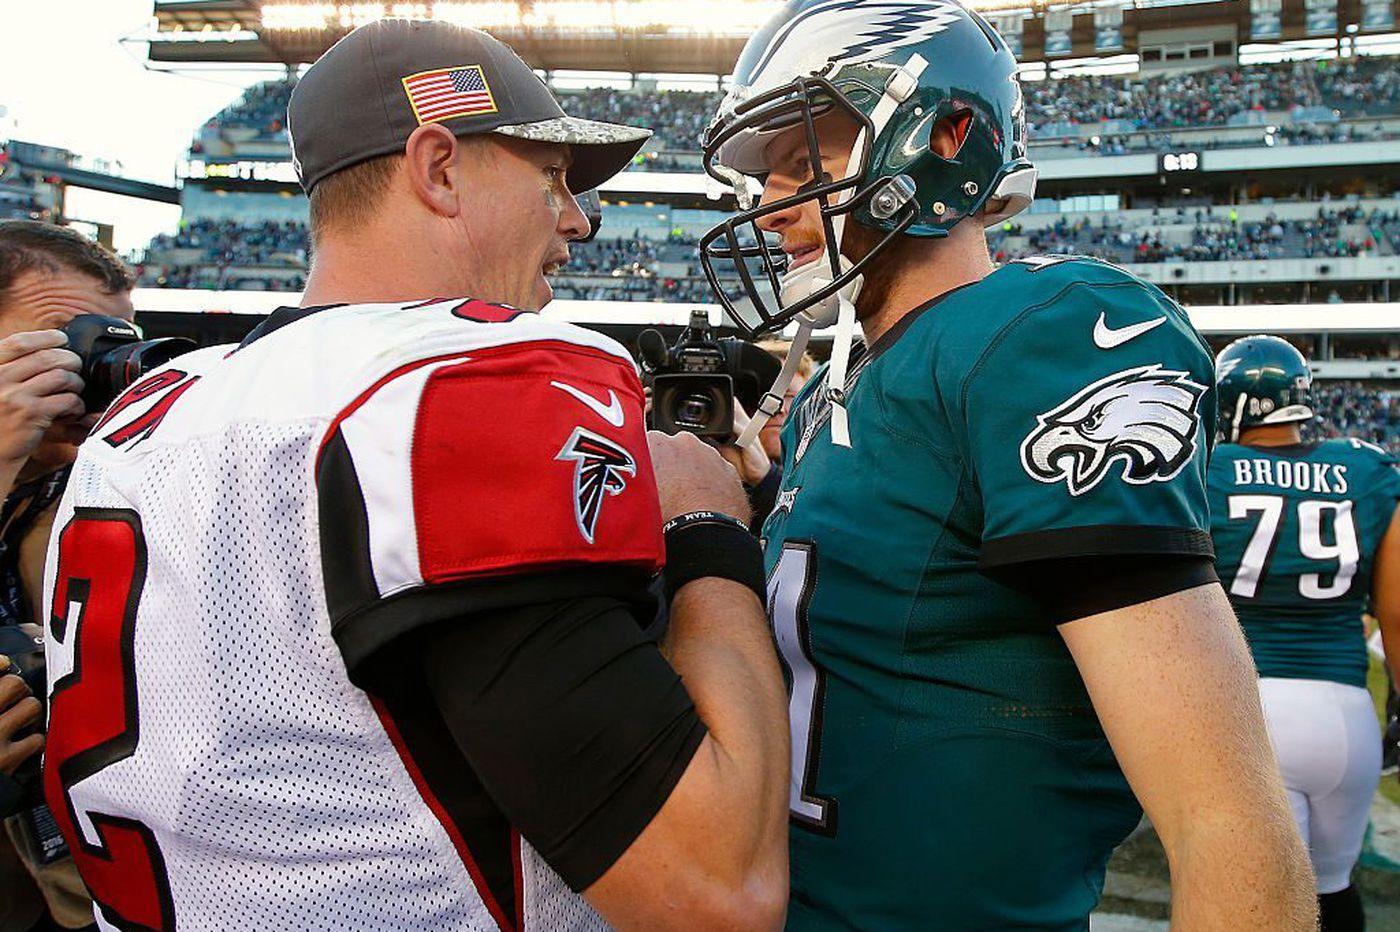 New coach Rich Scangerello has praise for Eagles quarterback Carson Wentz's mental approach